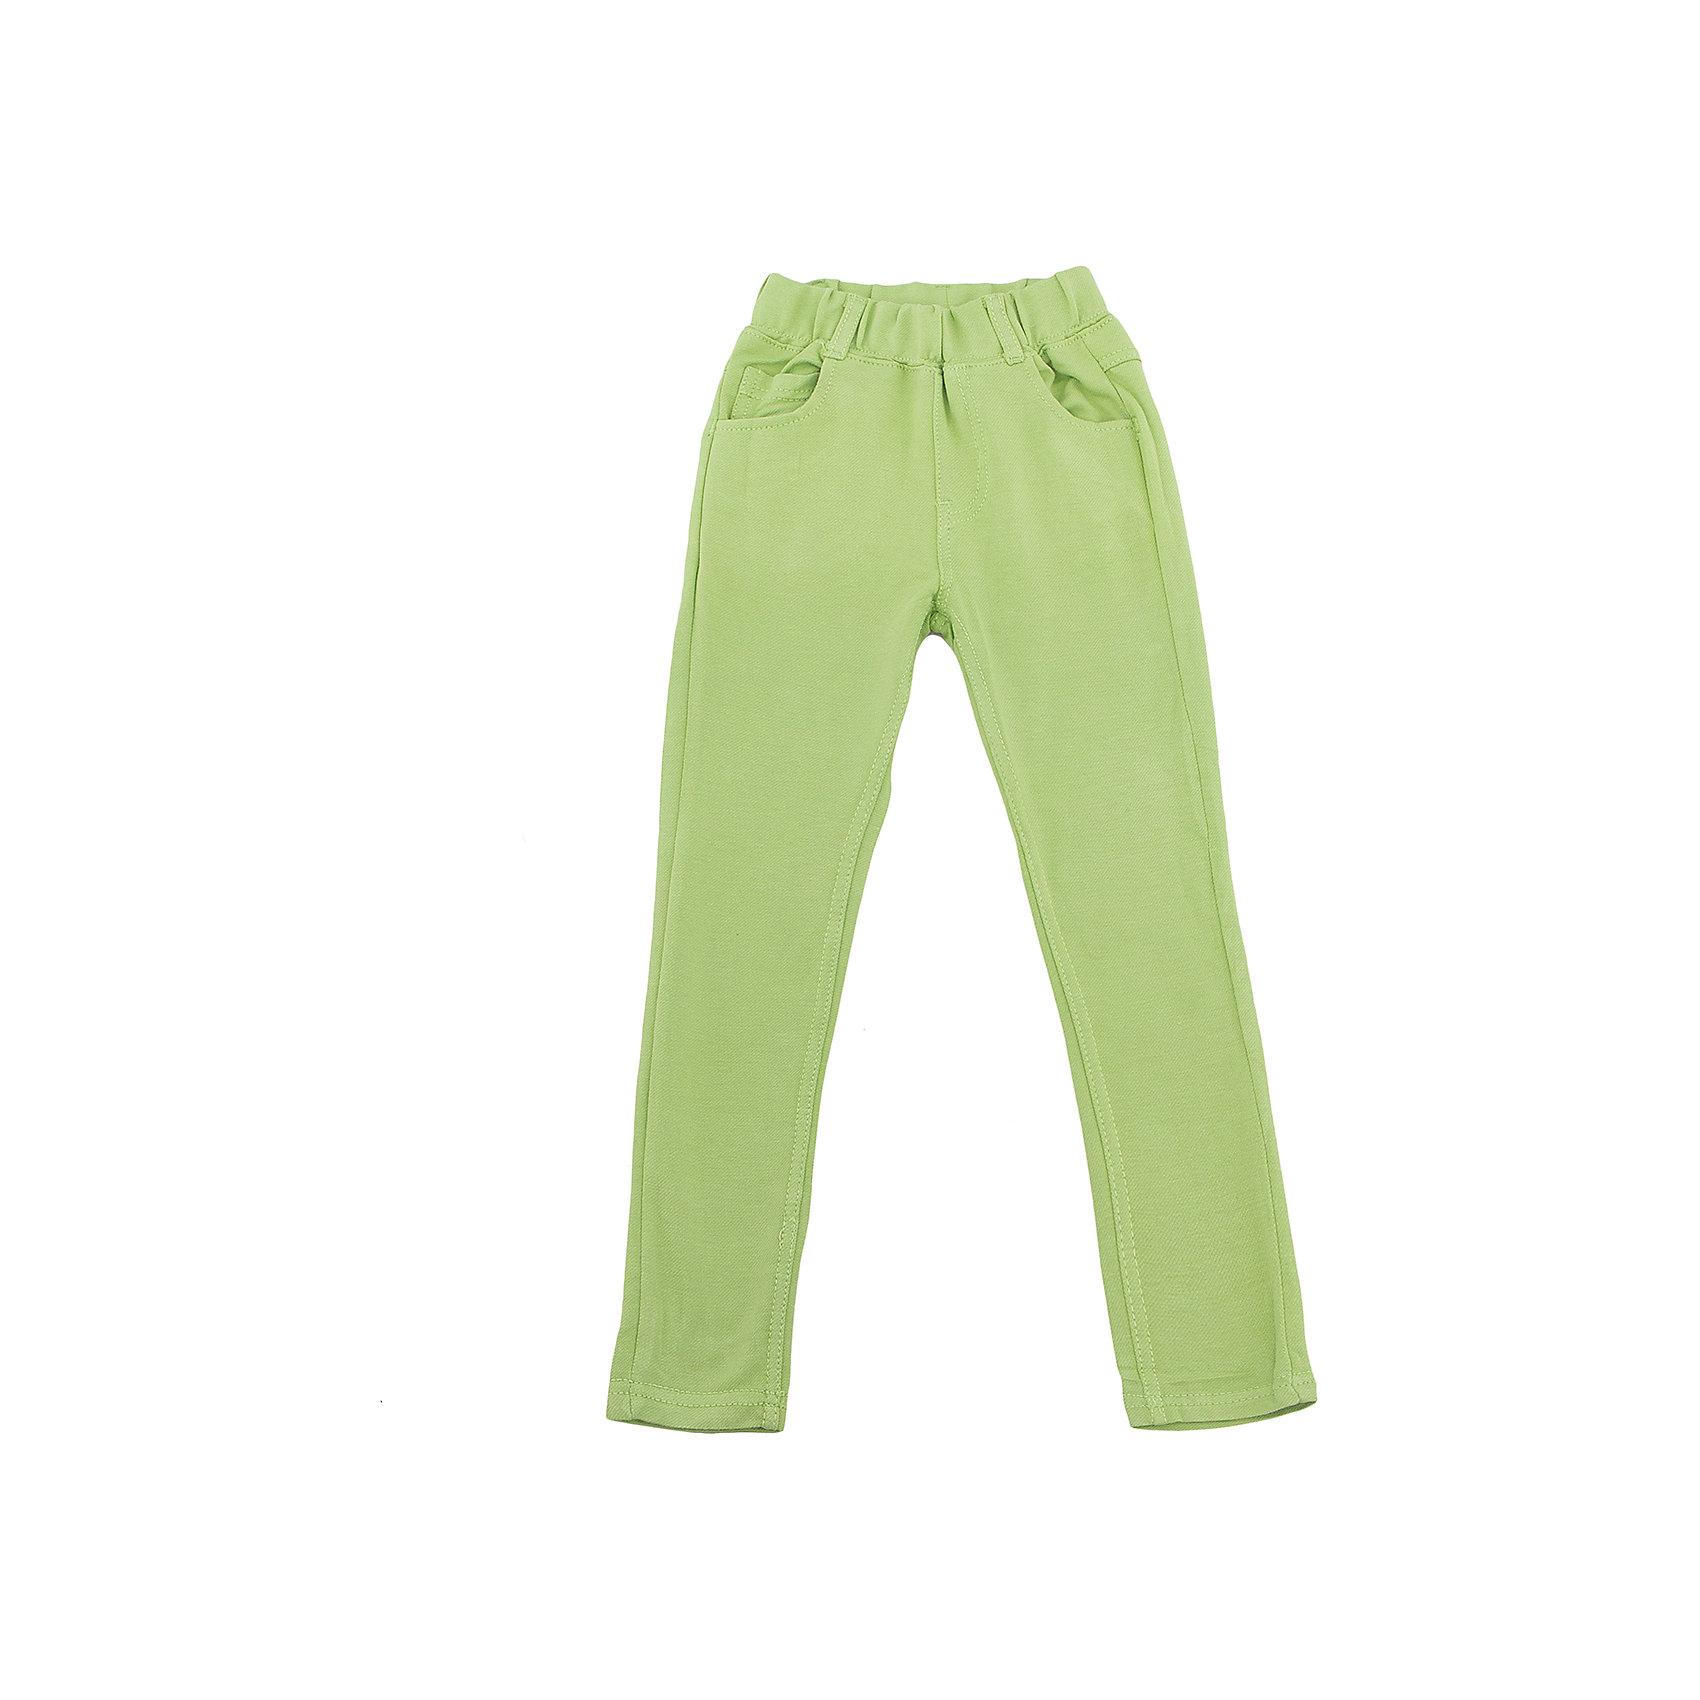 Леггинсы для девочки Sweet BerryТрикотажные брюки-джеггинсыдля девочки. Модель зауженного кроя. Два накладных кармана сзади.<br>Состав:<br>95%хлопок 5%эластан<br><br>Ширина мм: 123<br>Глубина мм: 10<br>Высота мм: 149<br>Вес г: 209<br>Цвет: зеленый<br>Возраст от месяцев: 36<br>Возраст до месяцев: 48<br>Пол: Женский<br>Возраст: Детский<br>Размер: 104,98,110,116,122,128<br>SKU: 5410080